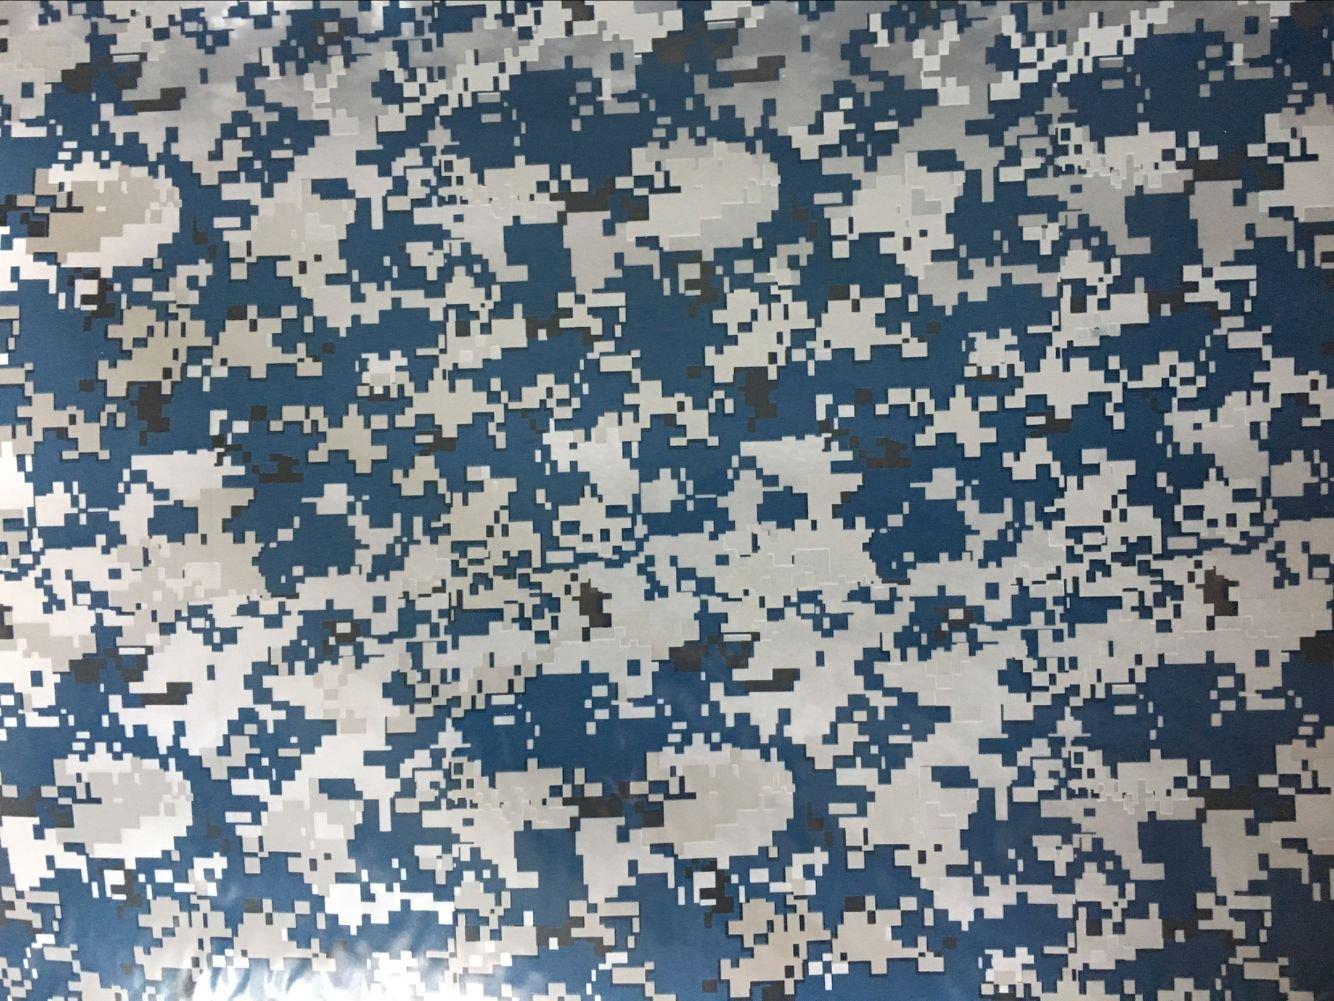 L'Impression de transfert de l'eau film 0.5mx2m Nacy ACU Camouflage film film Hydrographics de transfert à l'eau Colorful Hydrographics Coating